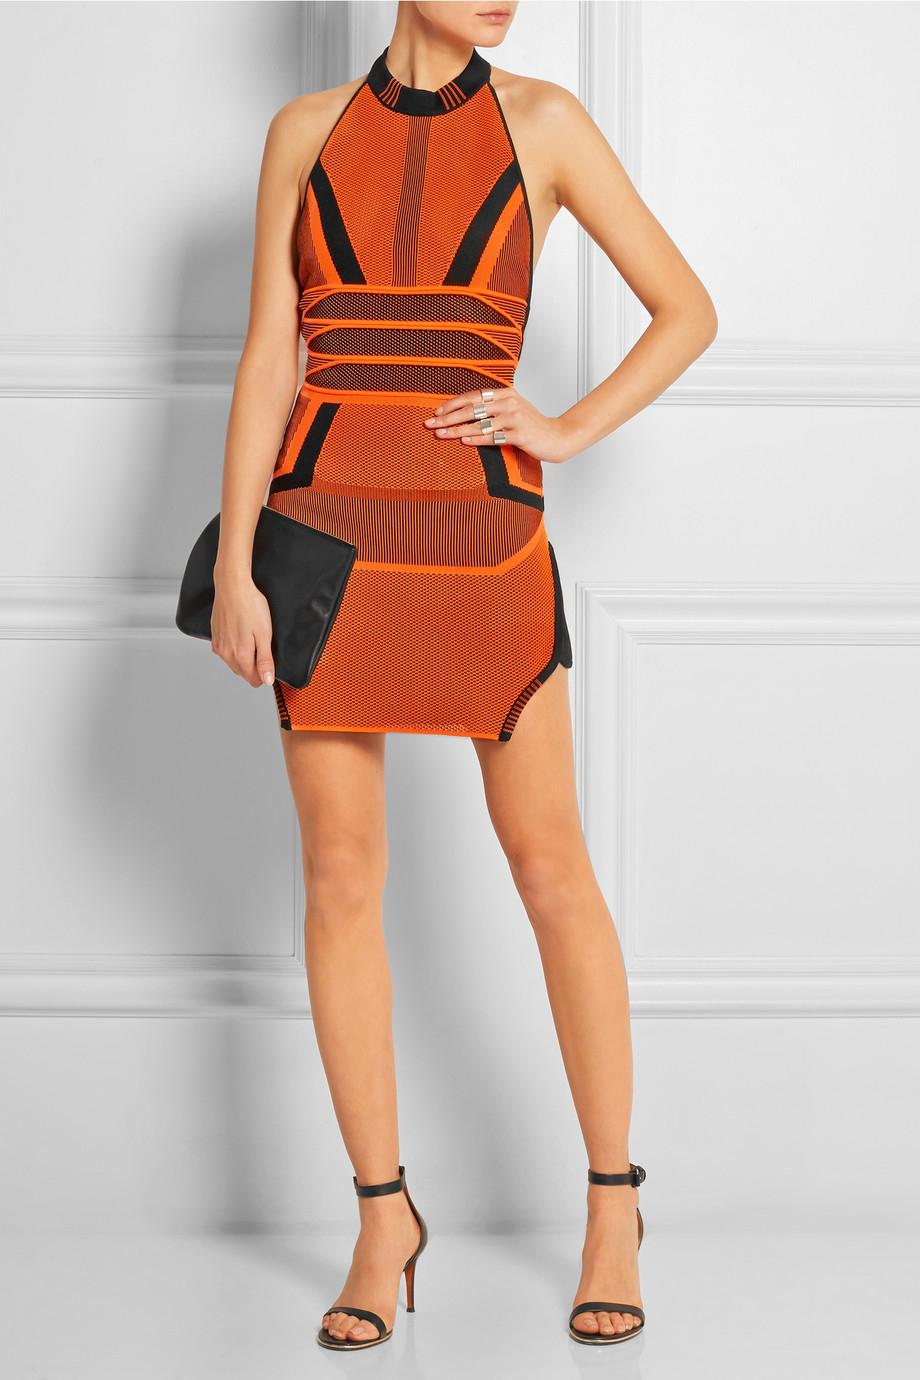 Alexander Wang Knit Mini Dress Discount Pictures E4MI03lr6